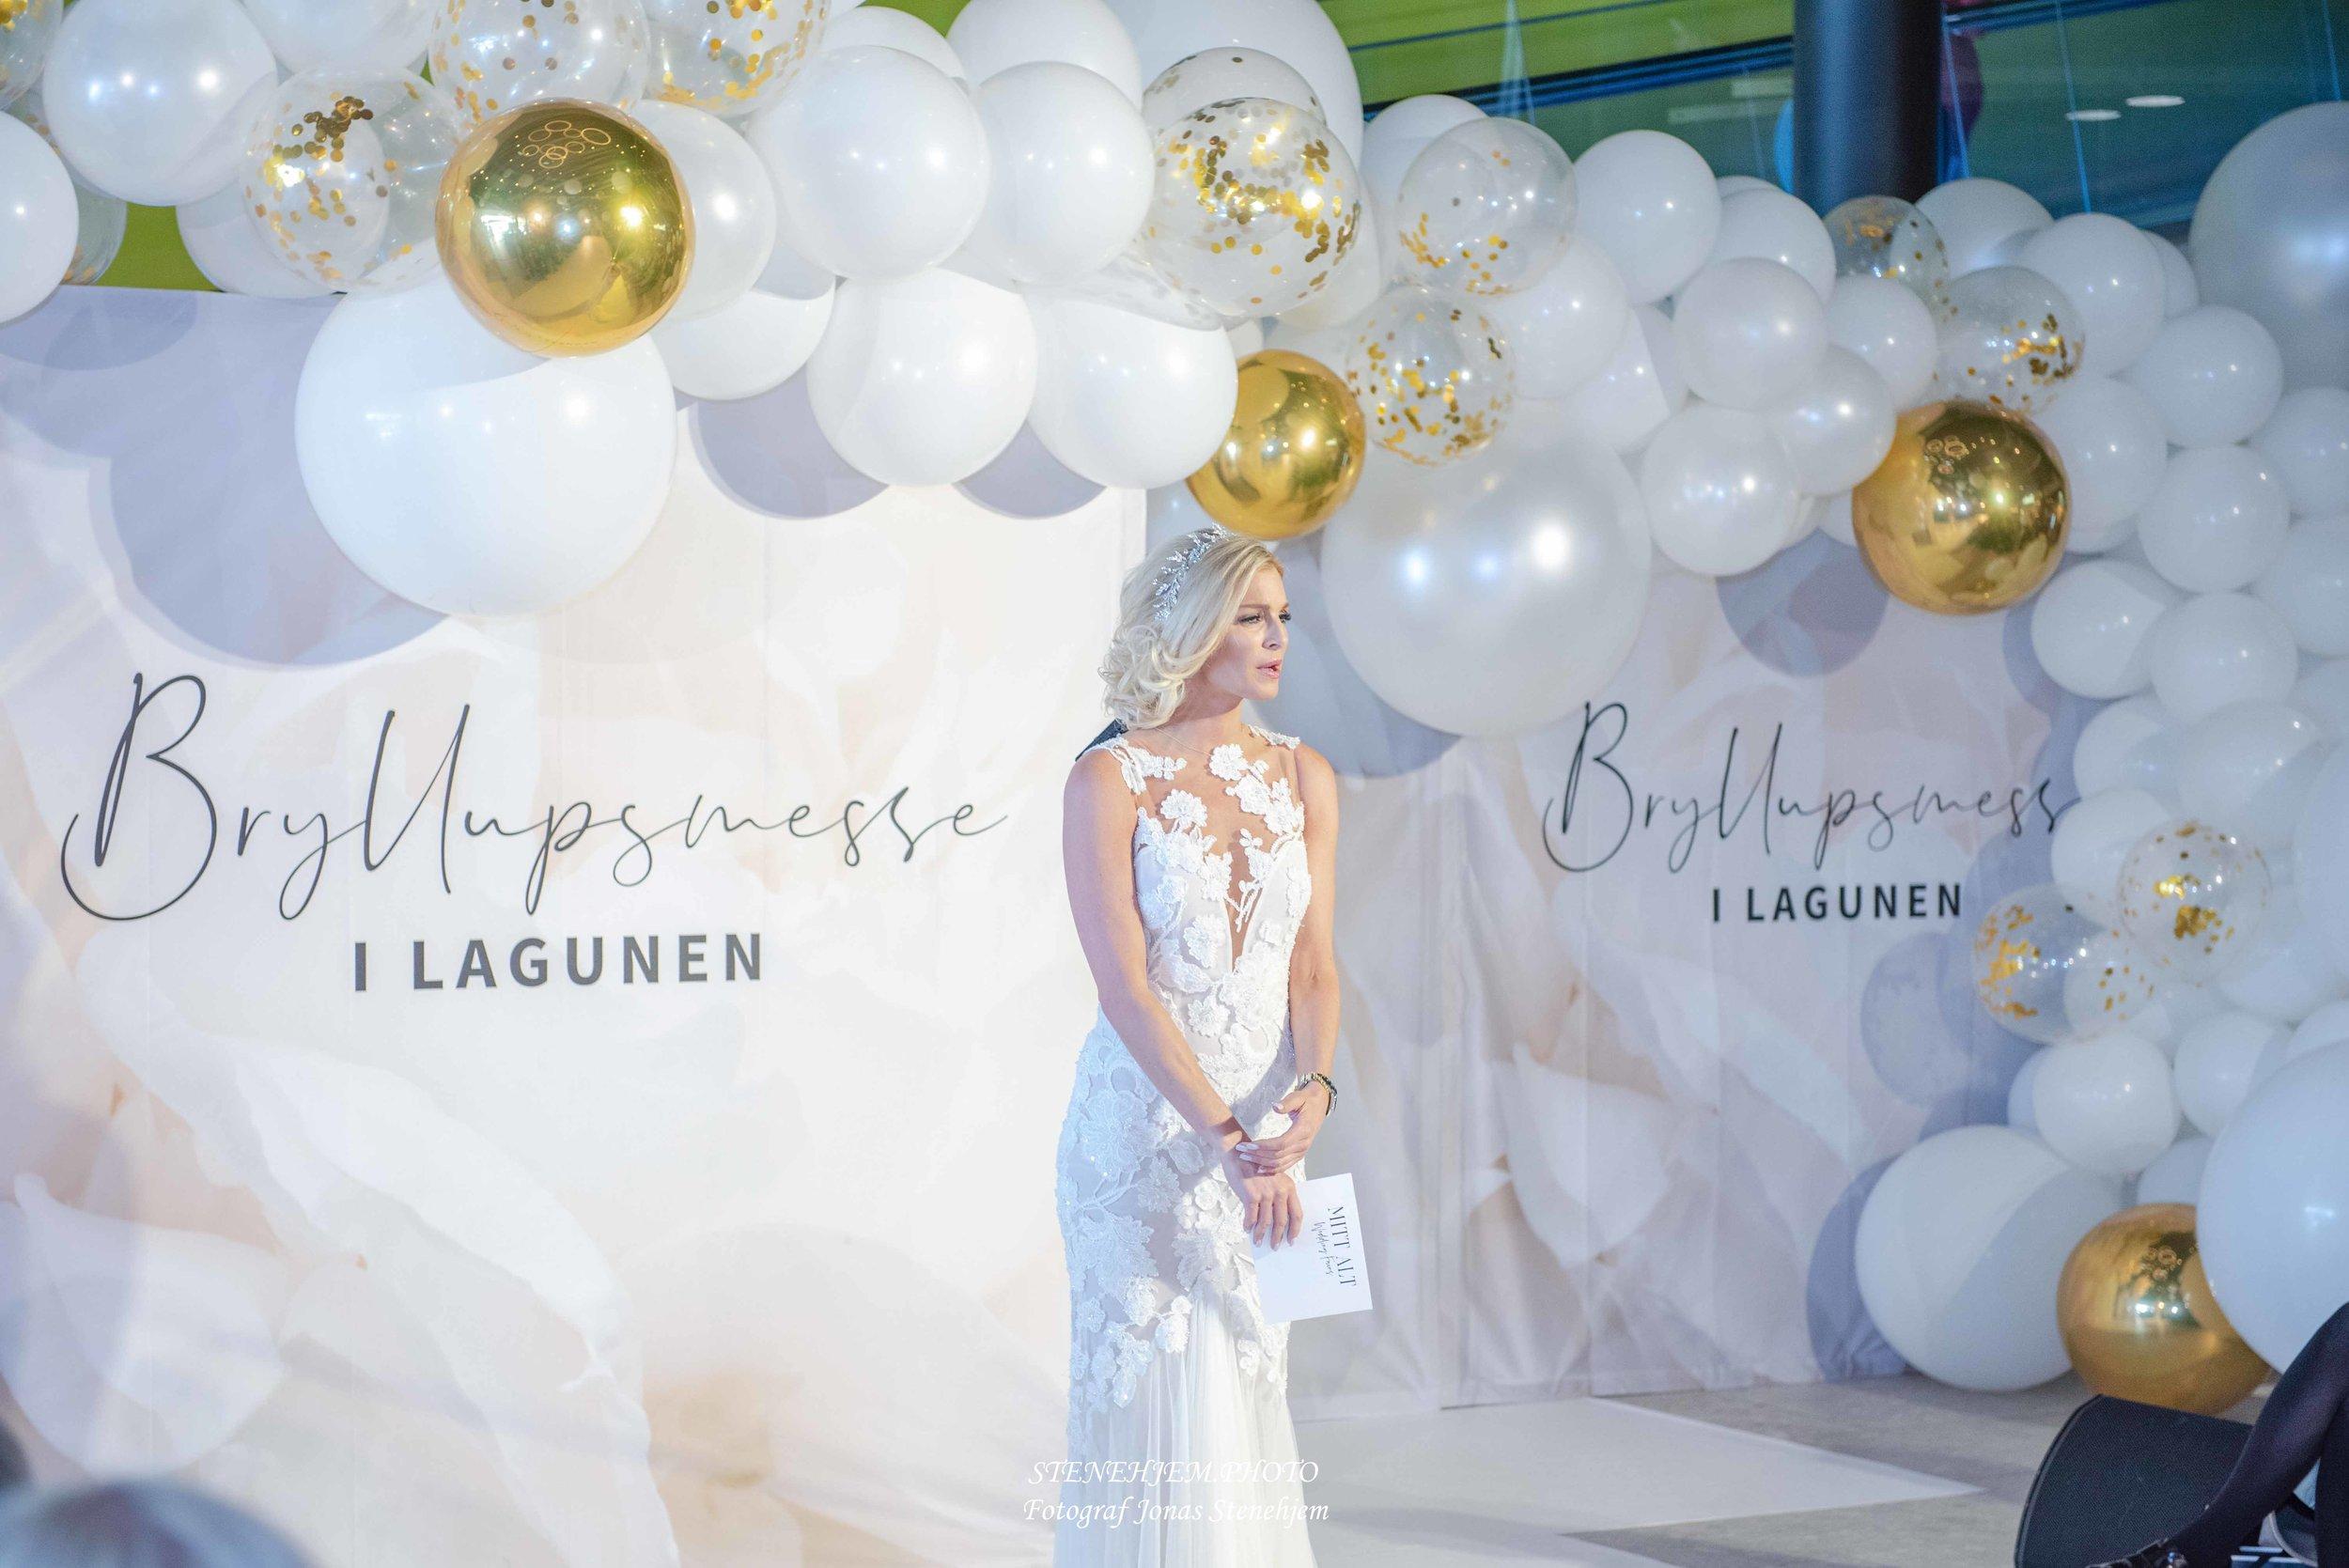 Bryllupsmesse_Lagunen_mittaltweddingfair__017.jpg